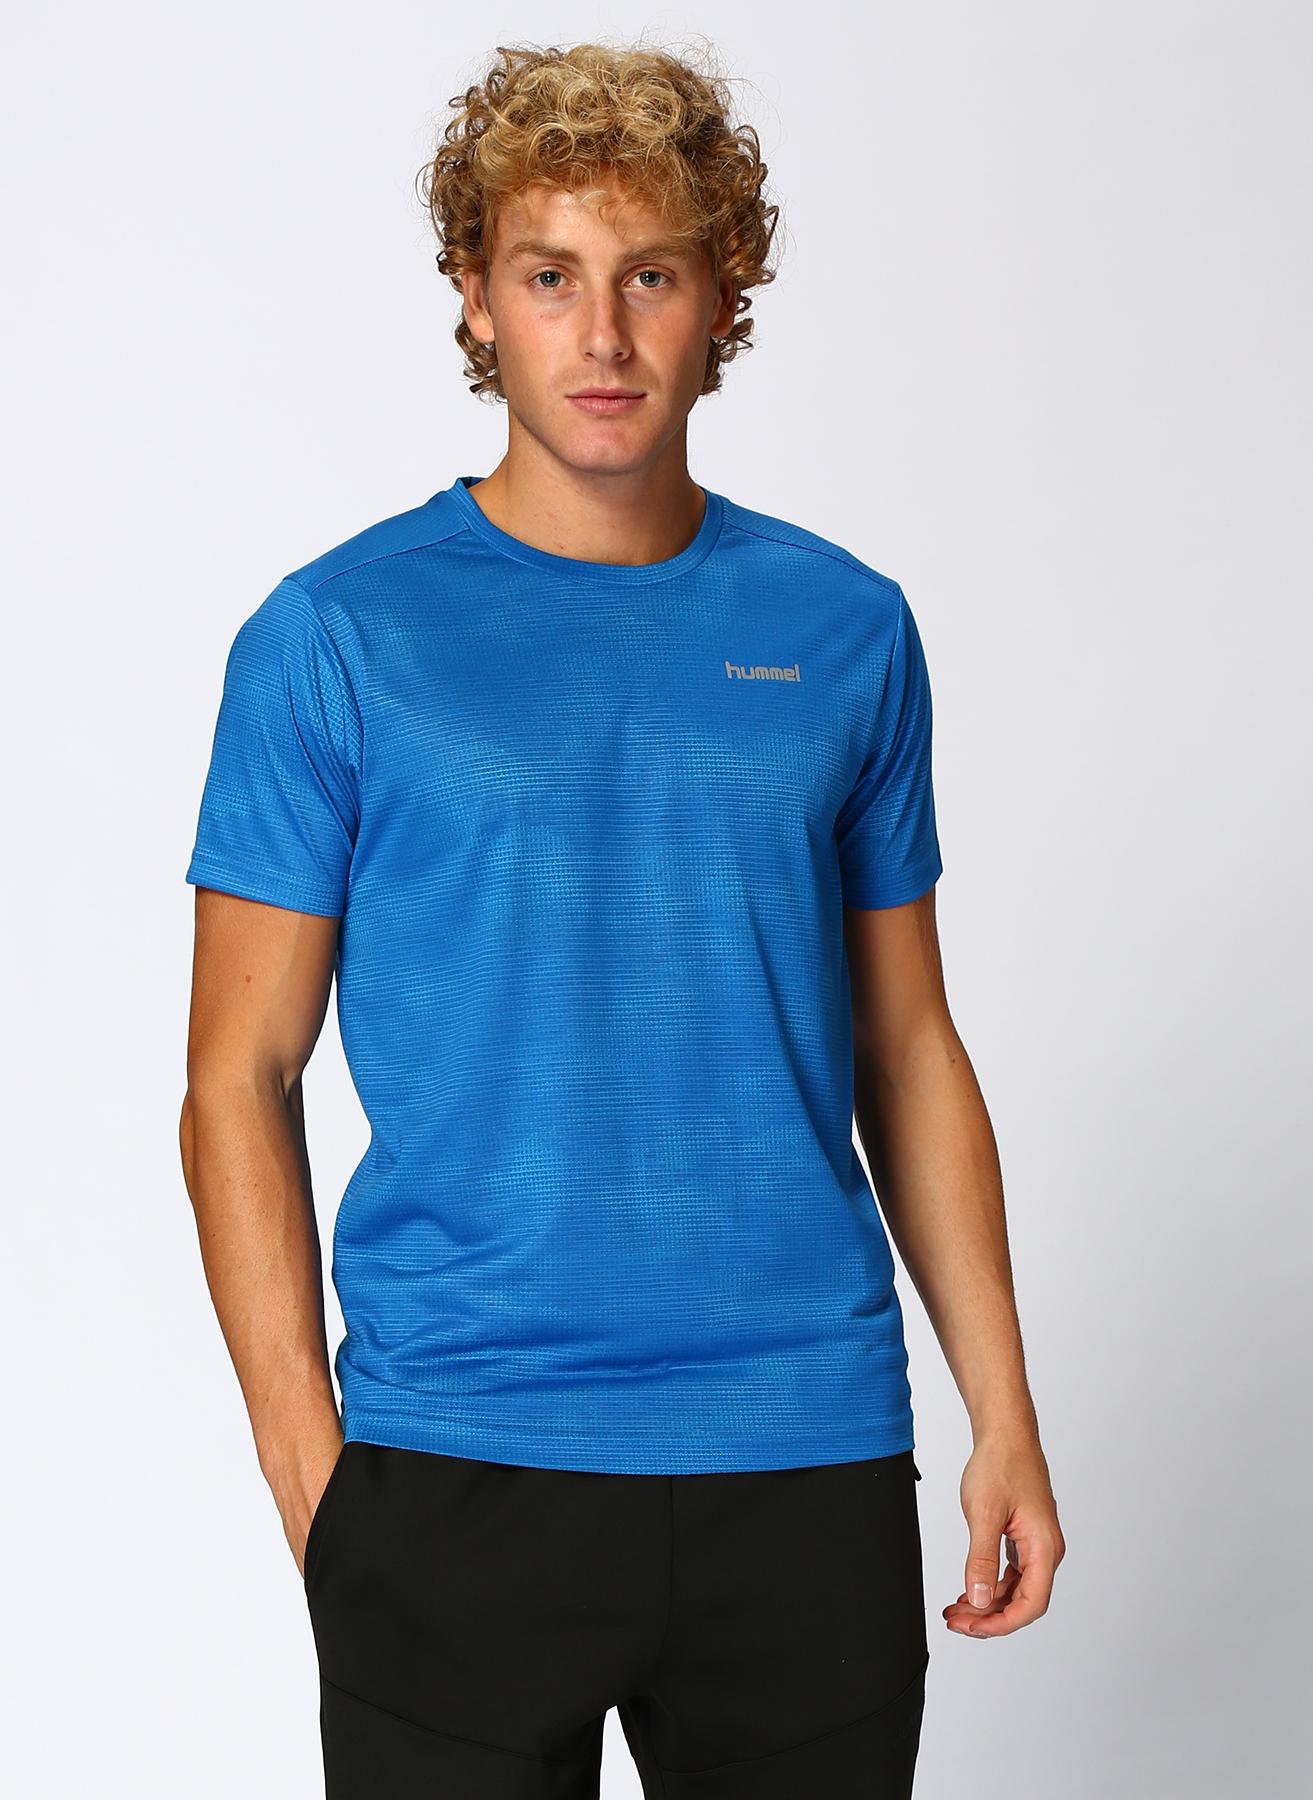 Hummel T-Shirt S 5001700322003 Ürün Resmi